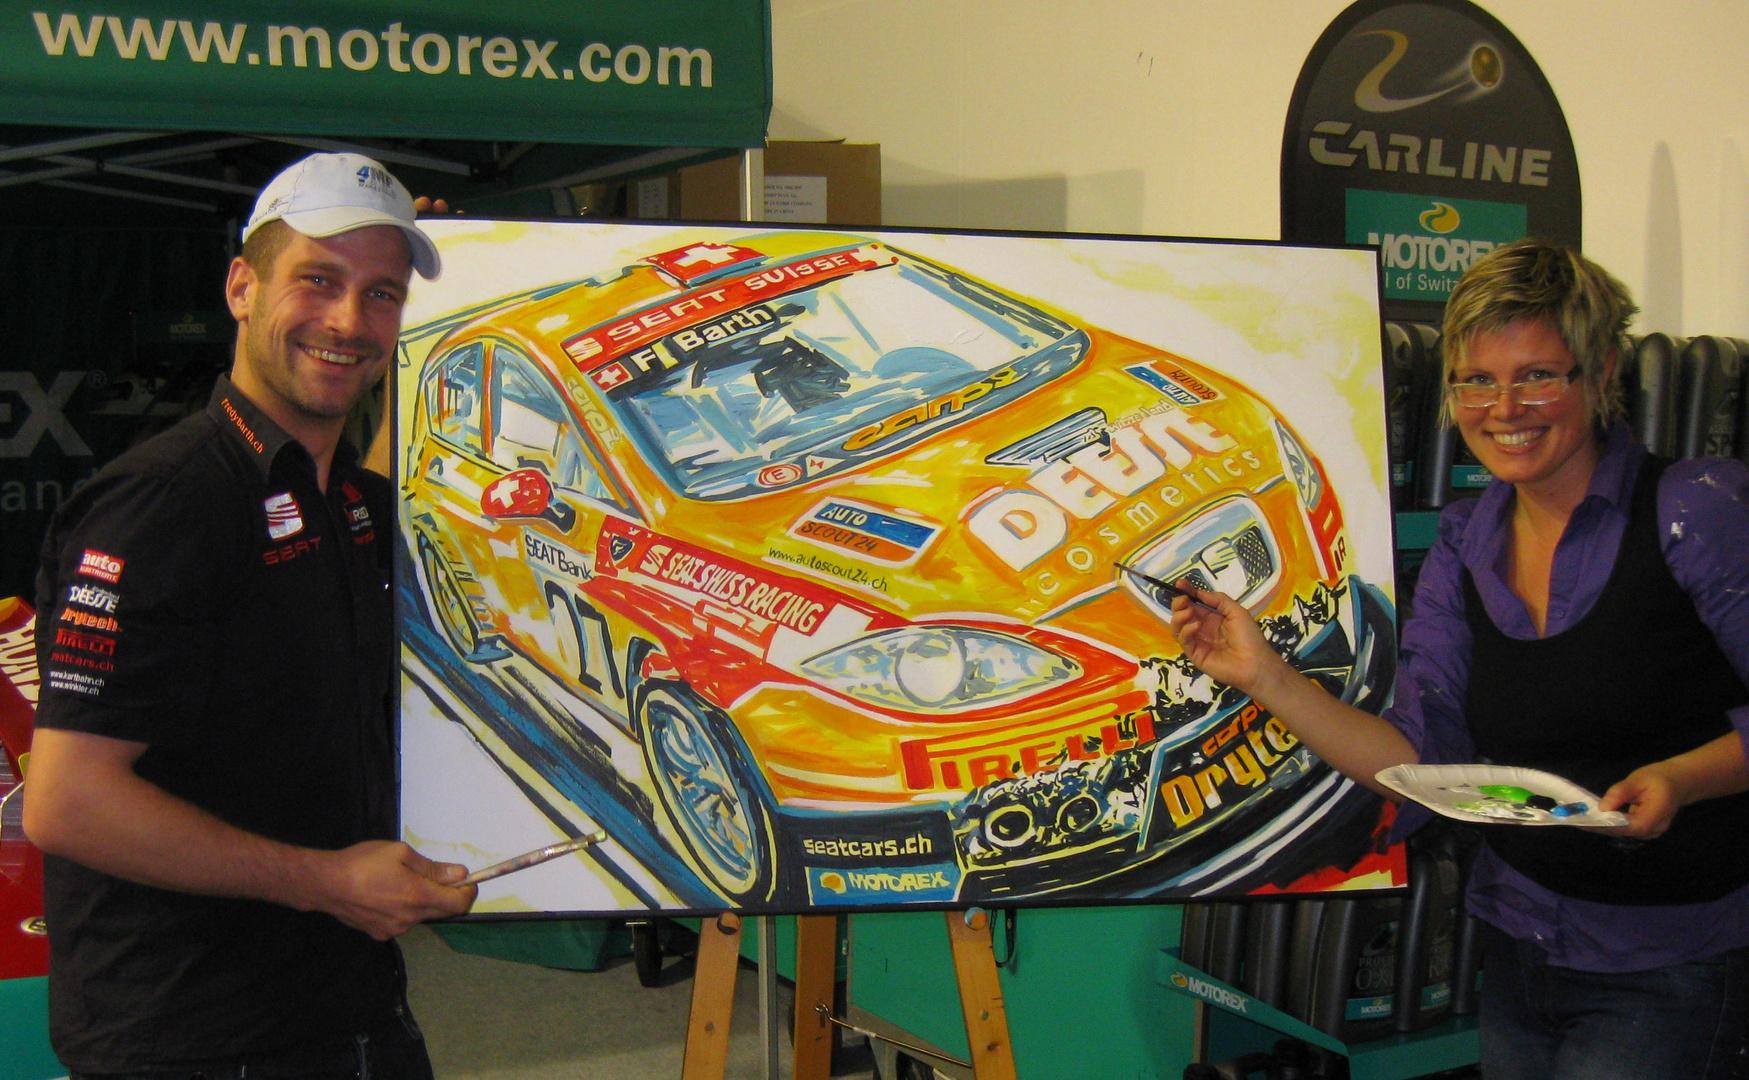 Rallyefahrer Fredy Barth als Co-Artist, 2009